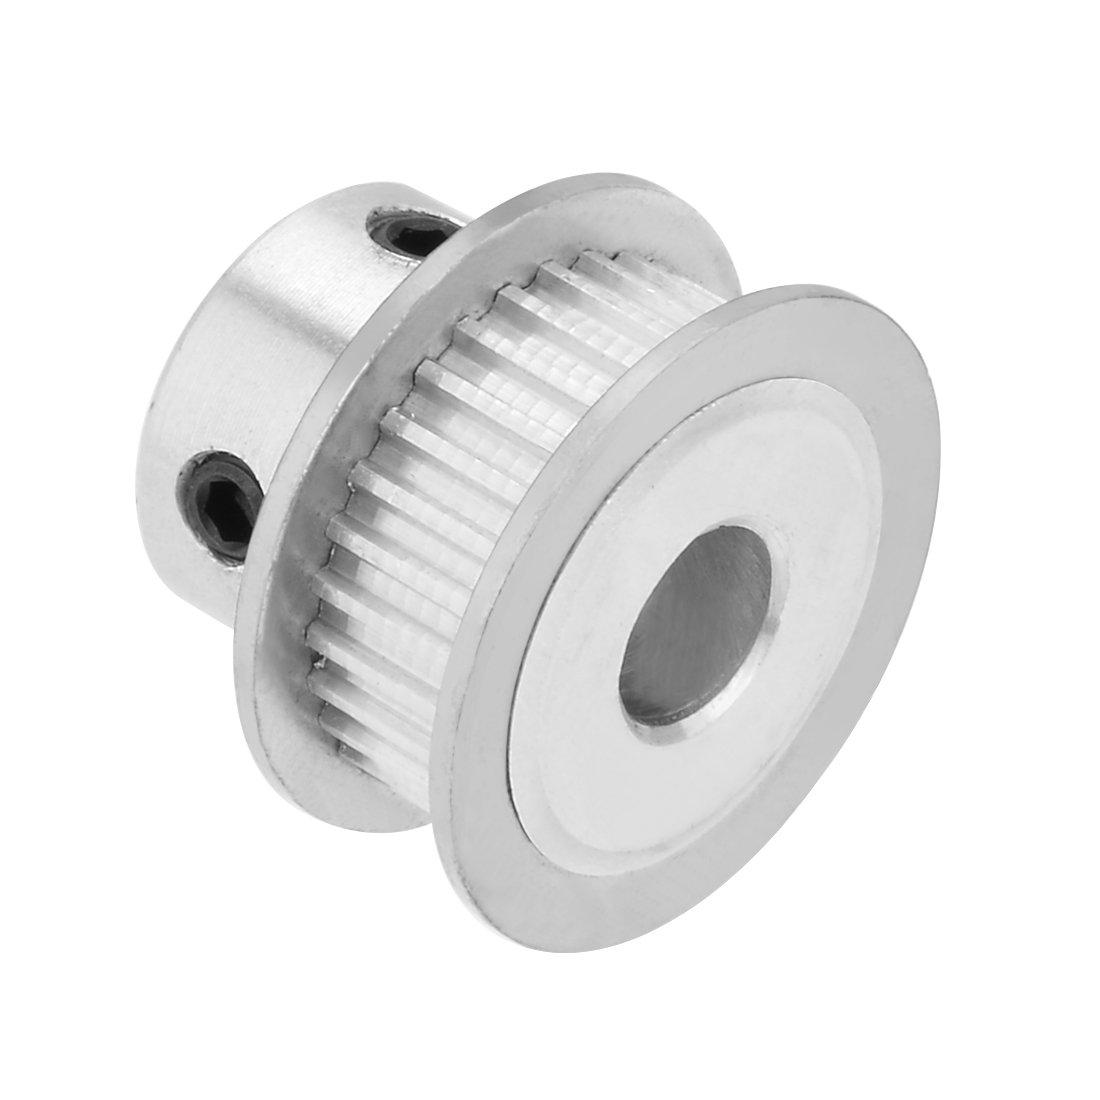 uxcell Aluminum MXL 25 Teeth 7mm Bore Timing Belt Idler Pulley Flange Synchronous Wheel for 6mm Belt 3D Printer CNC